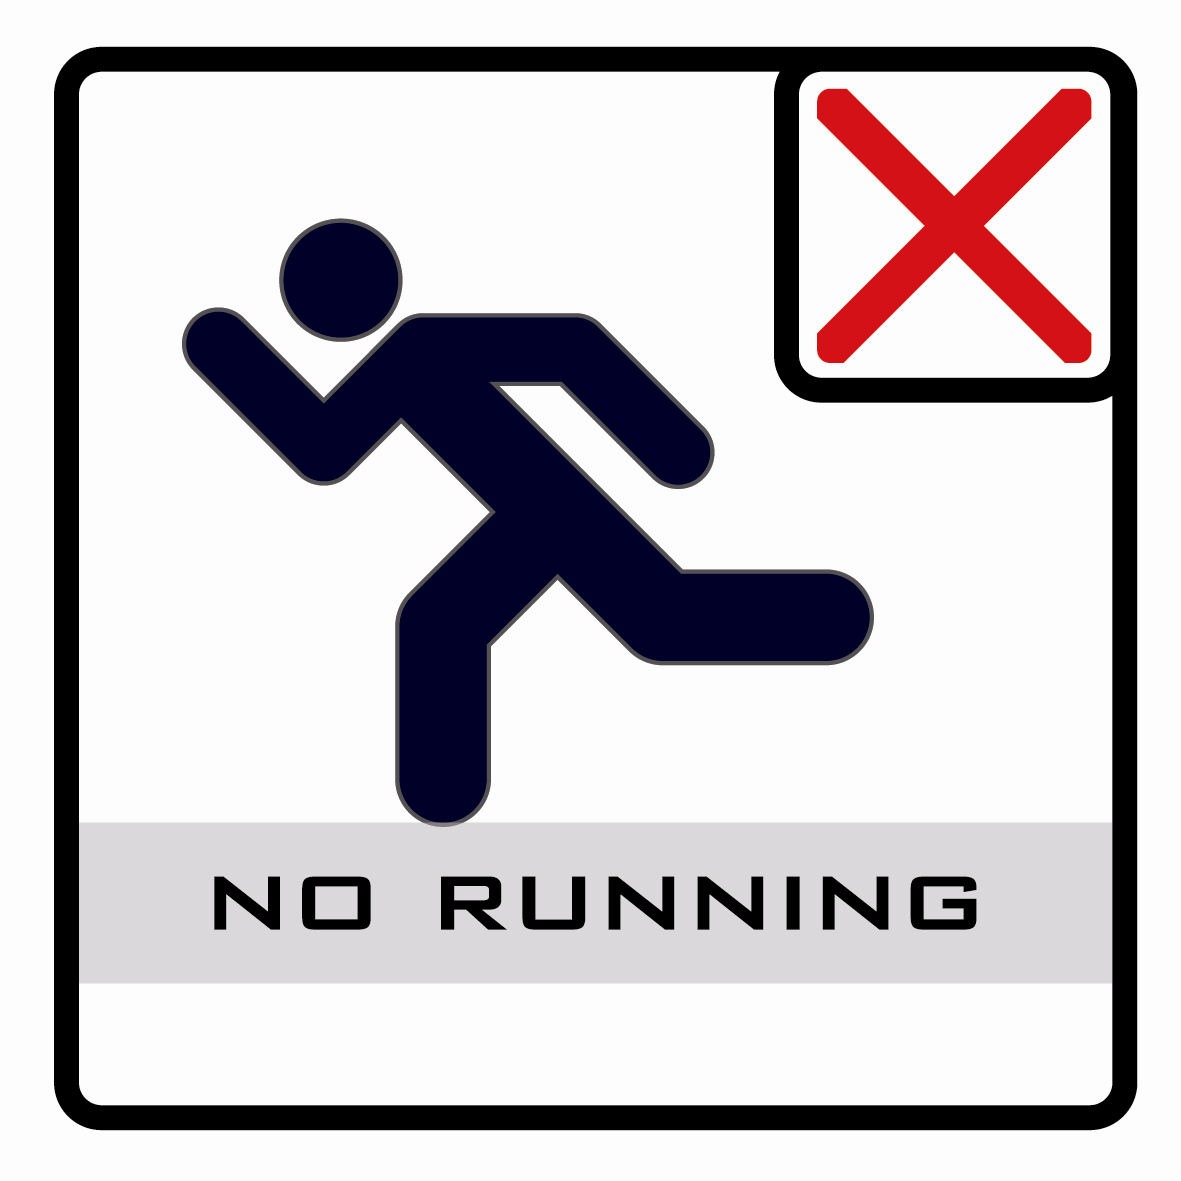 【icon】禁止奔跑